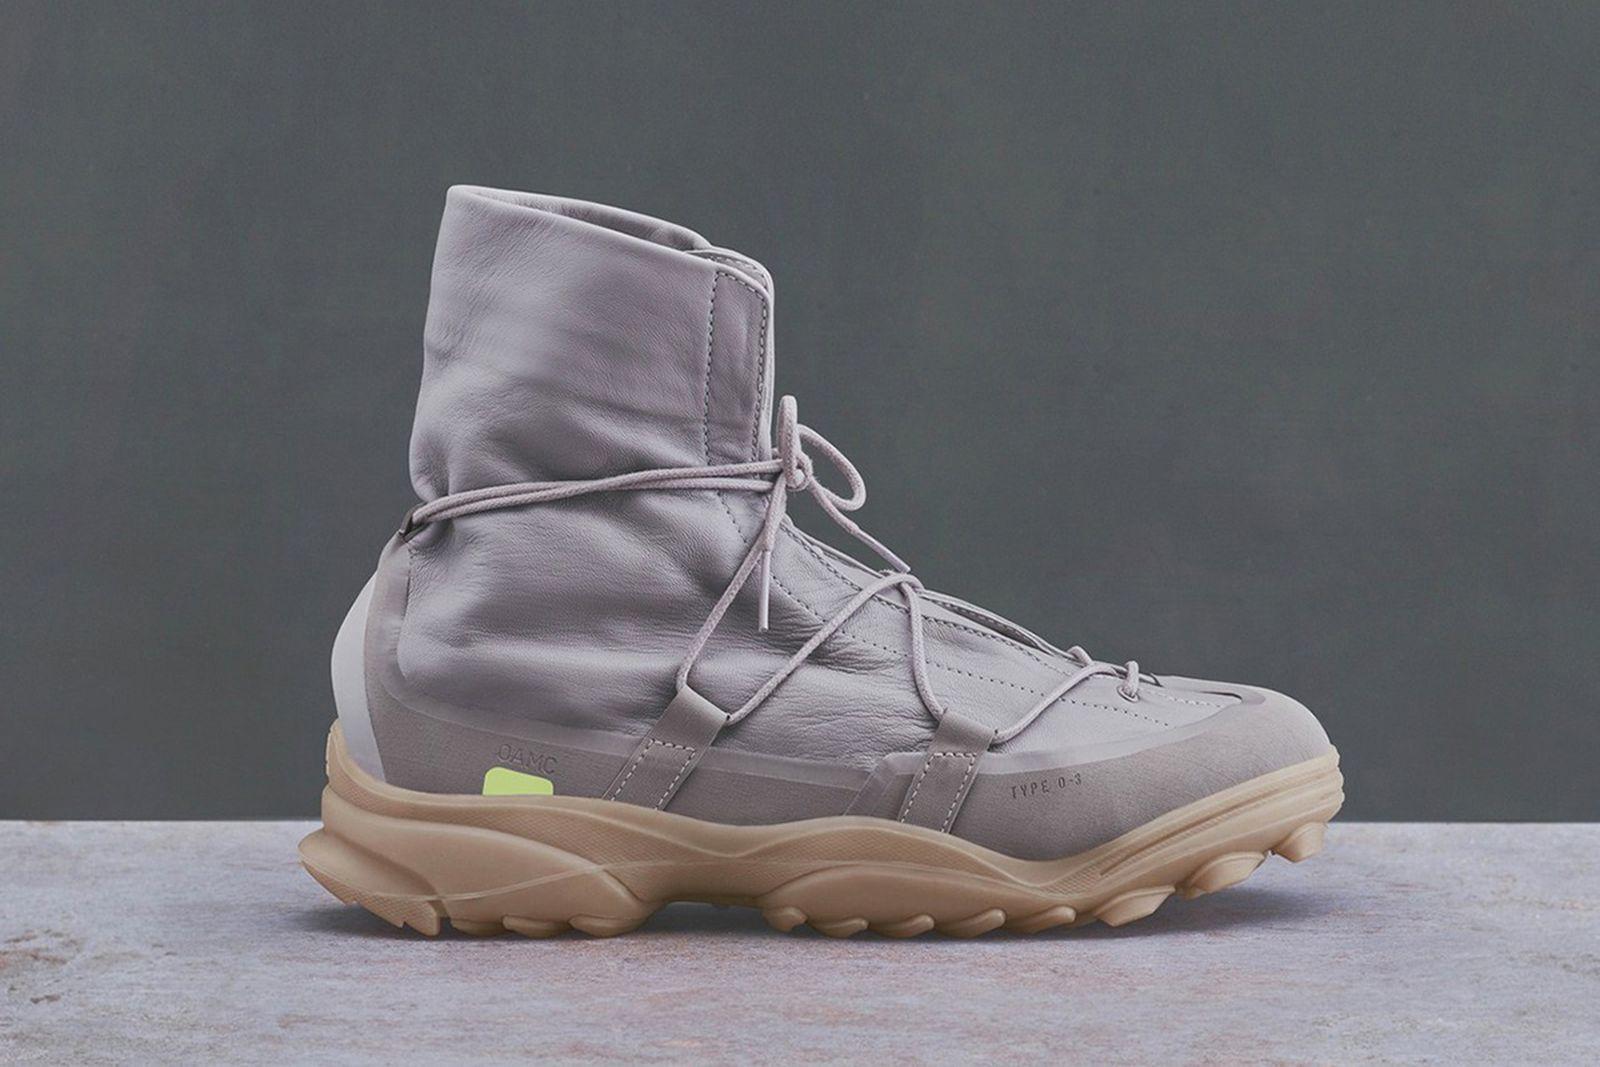 OAMC adidas Type 0-3 sneaker boot